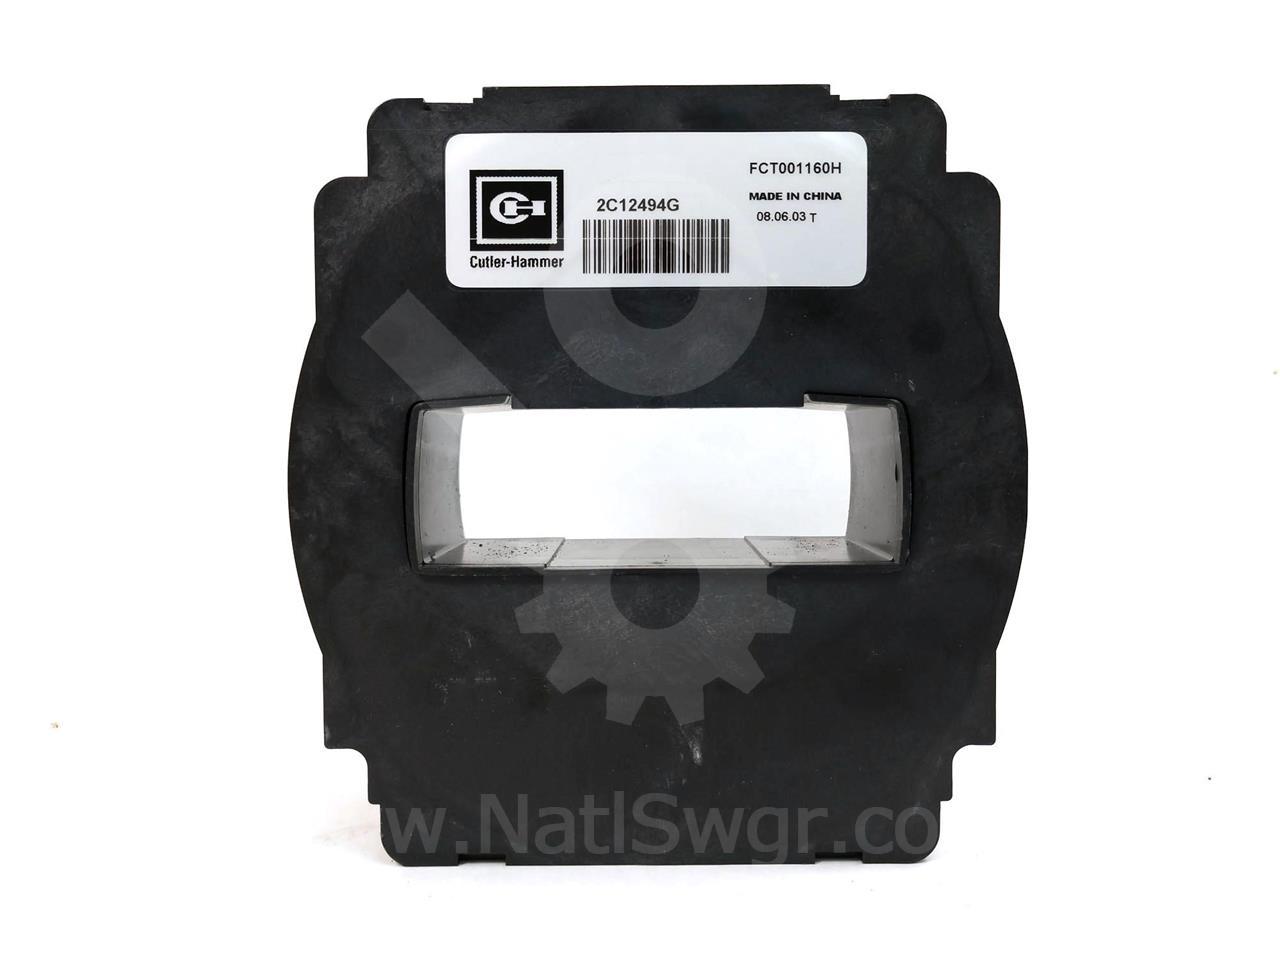 2C12494G32 3200A Cutler-Hammer CURRENT TRANSFORMER DIGITRIP FOR MDS